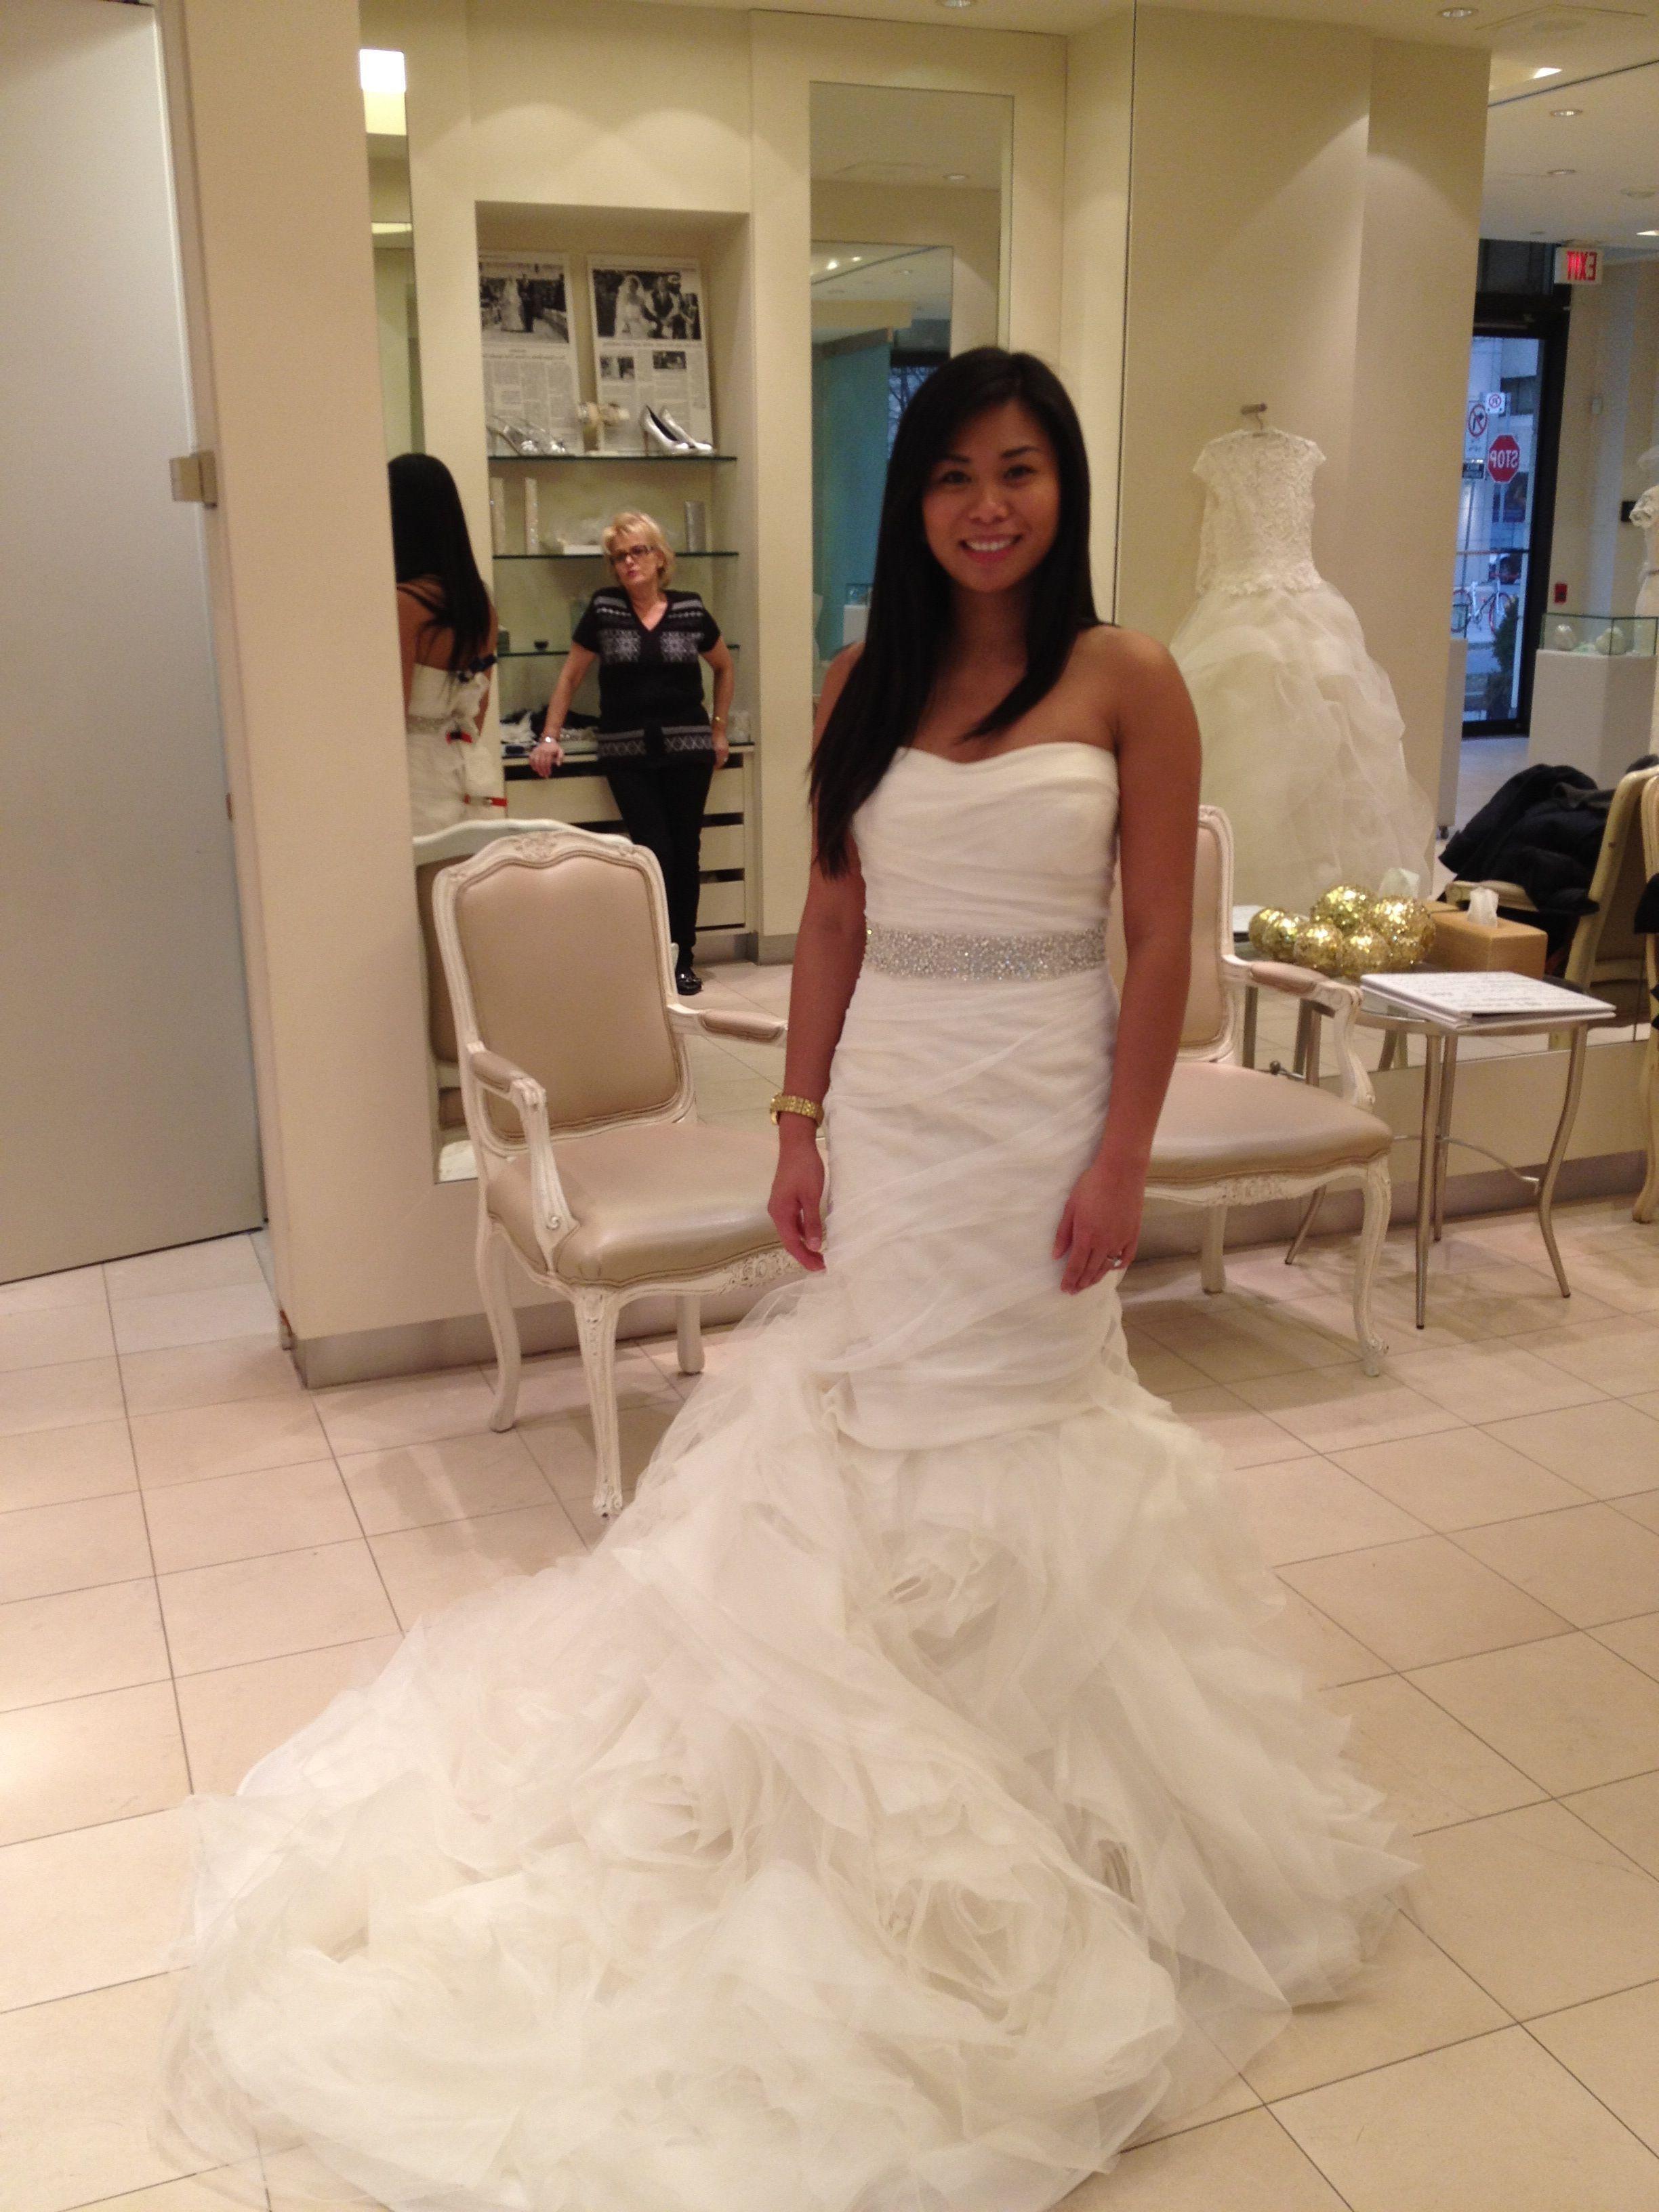 Cute wedding reception dresses for the bride  vera wang gemma with crystal belt  Wedding Ideas  Pinterest